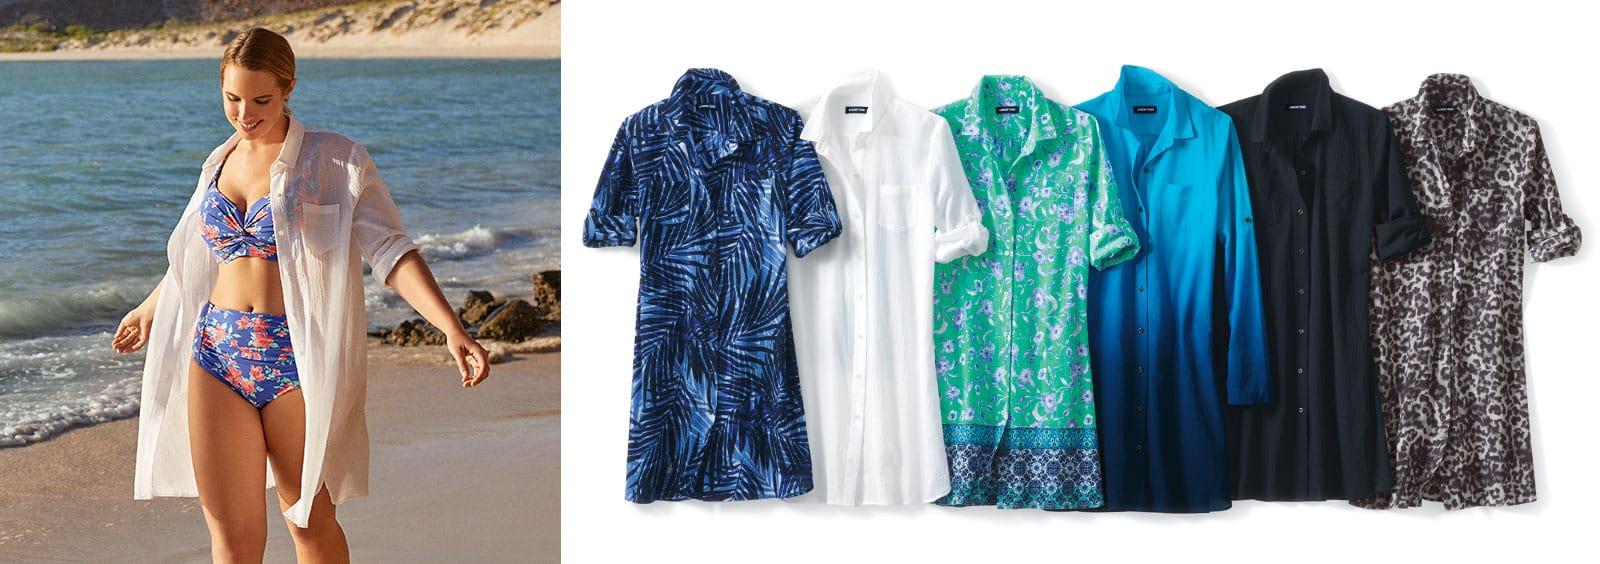 Best Plus Size Swim Dresses That You'll Love